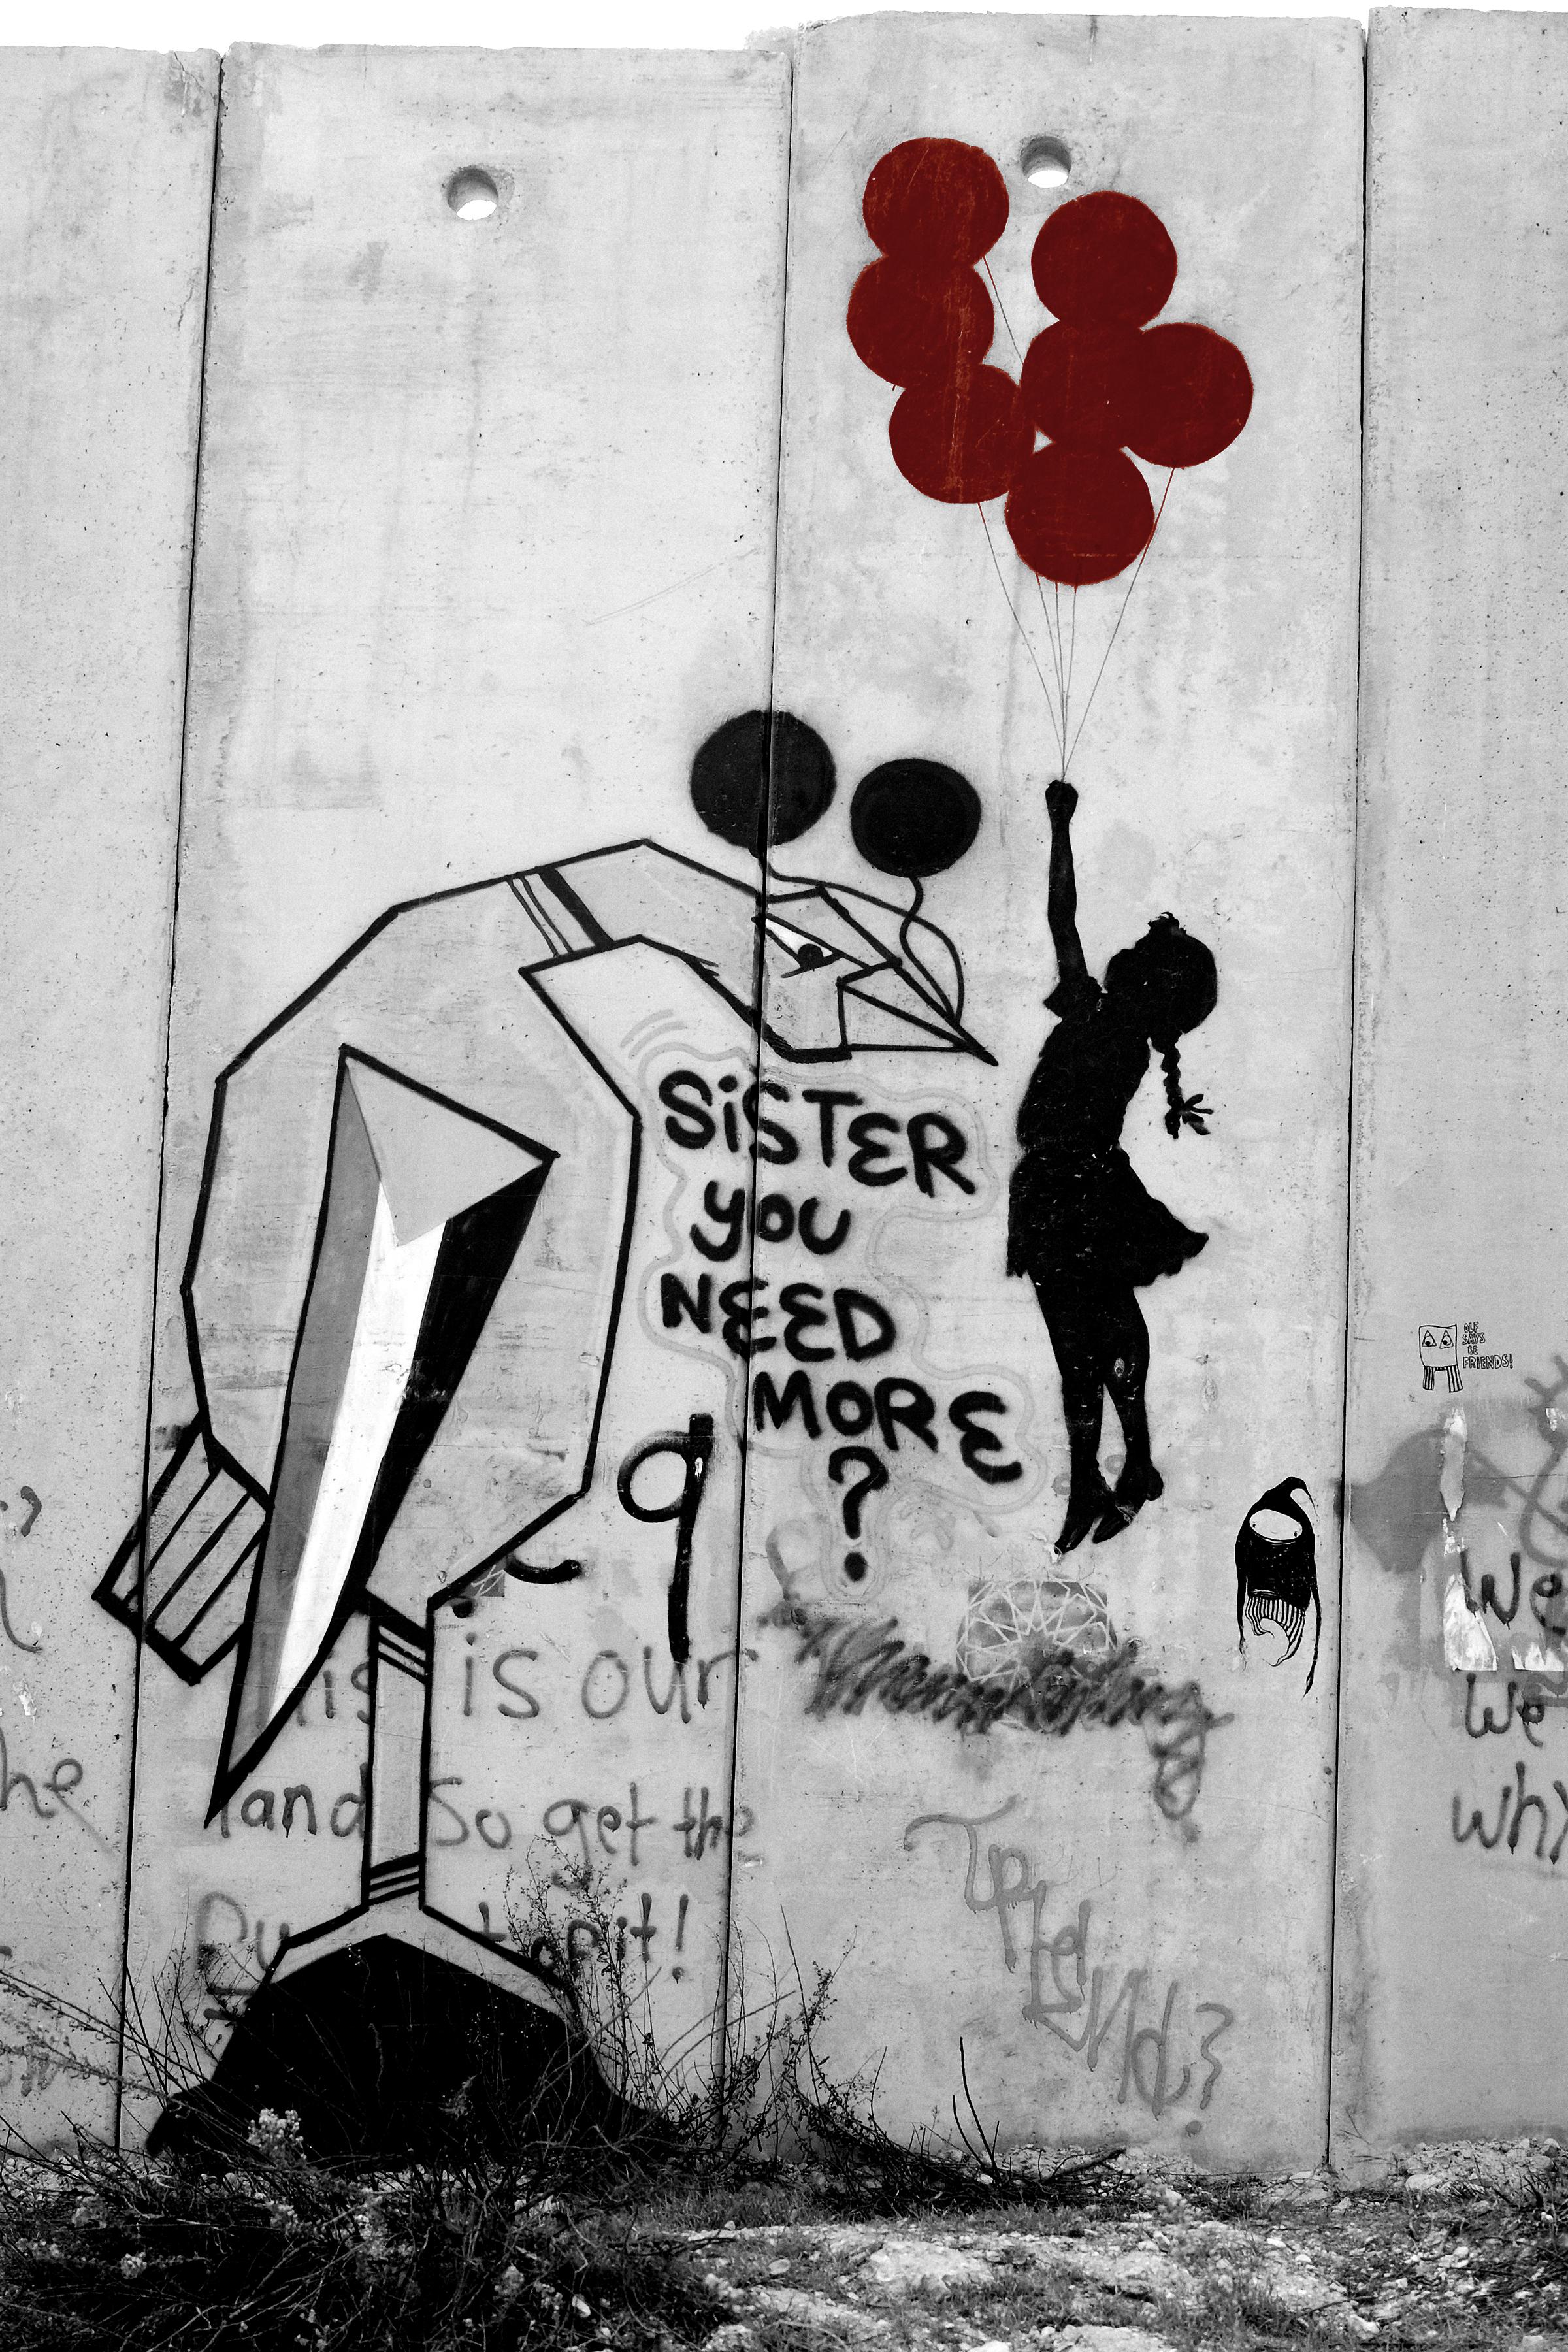 Balloon Girl Banksy Palestine #WithSyria